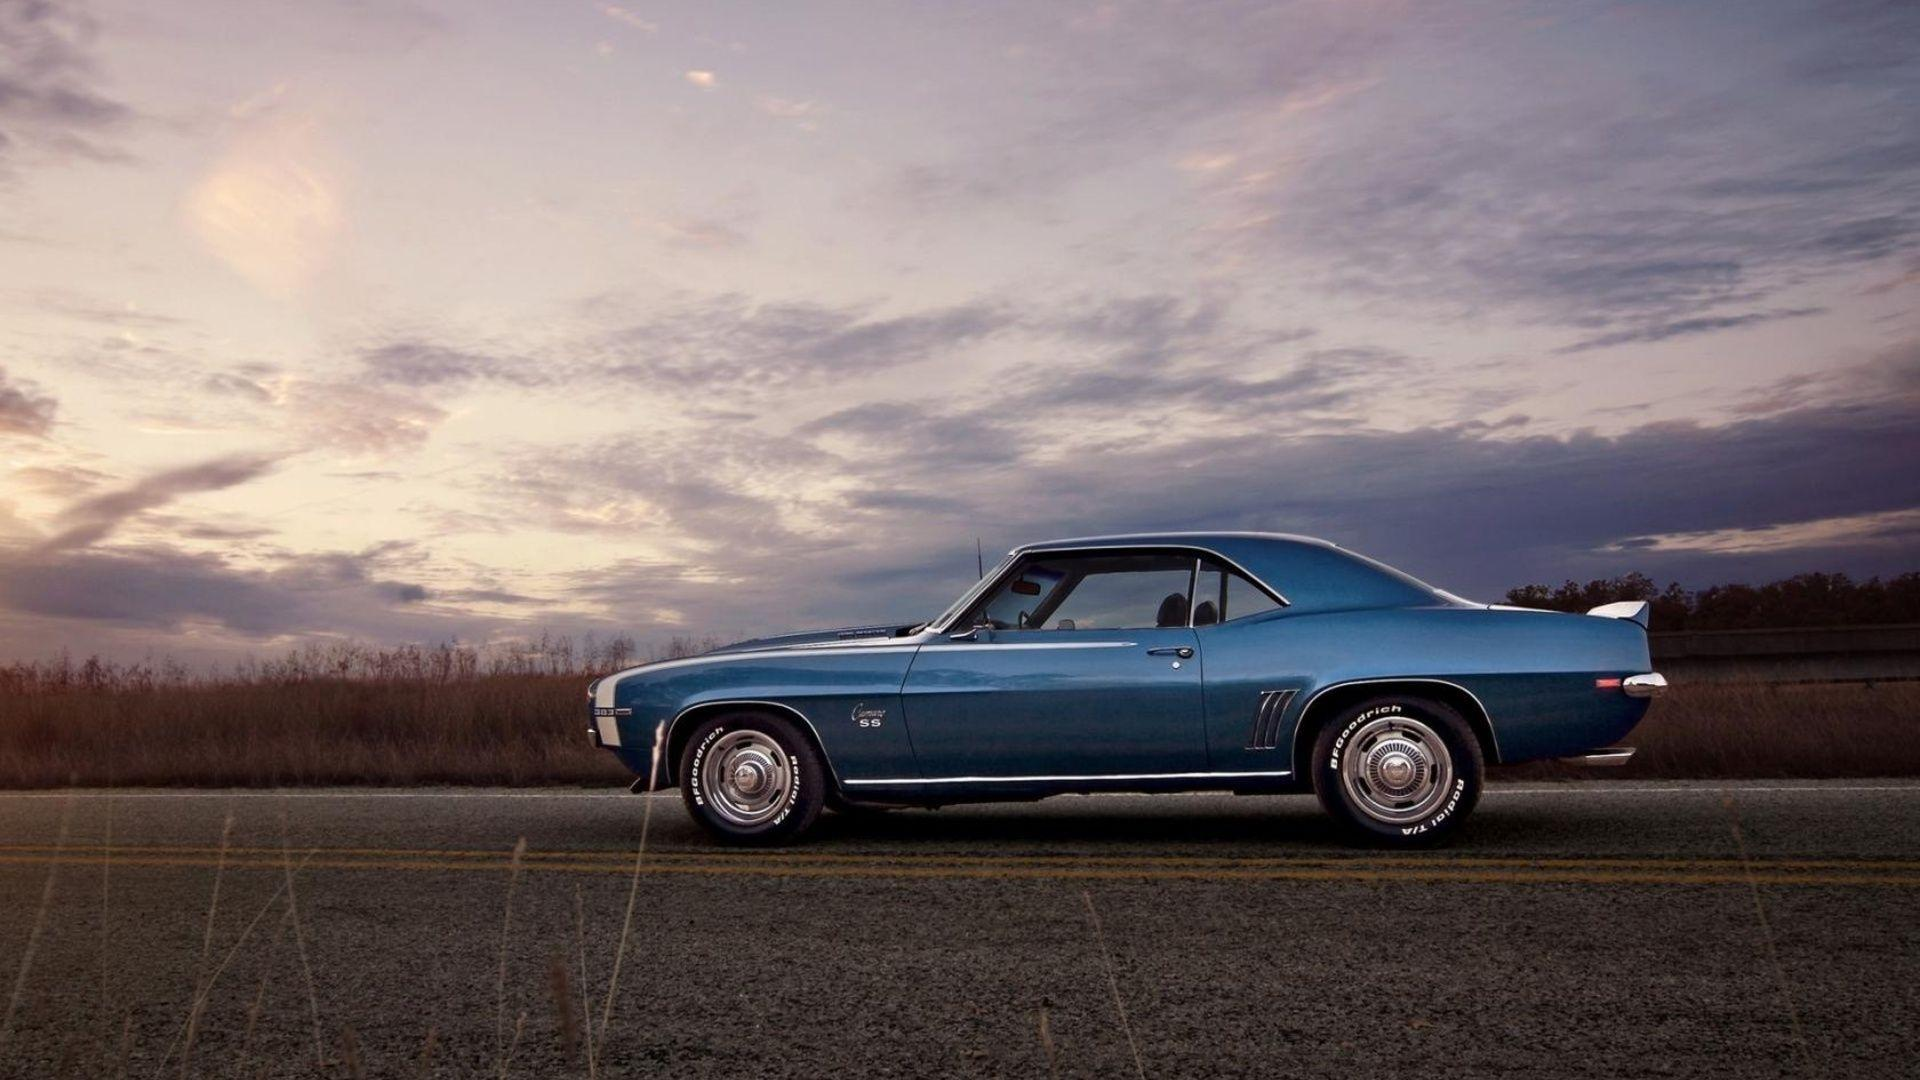 68 Camaro Wallpaper